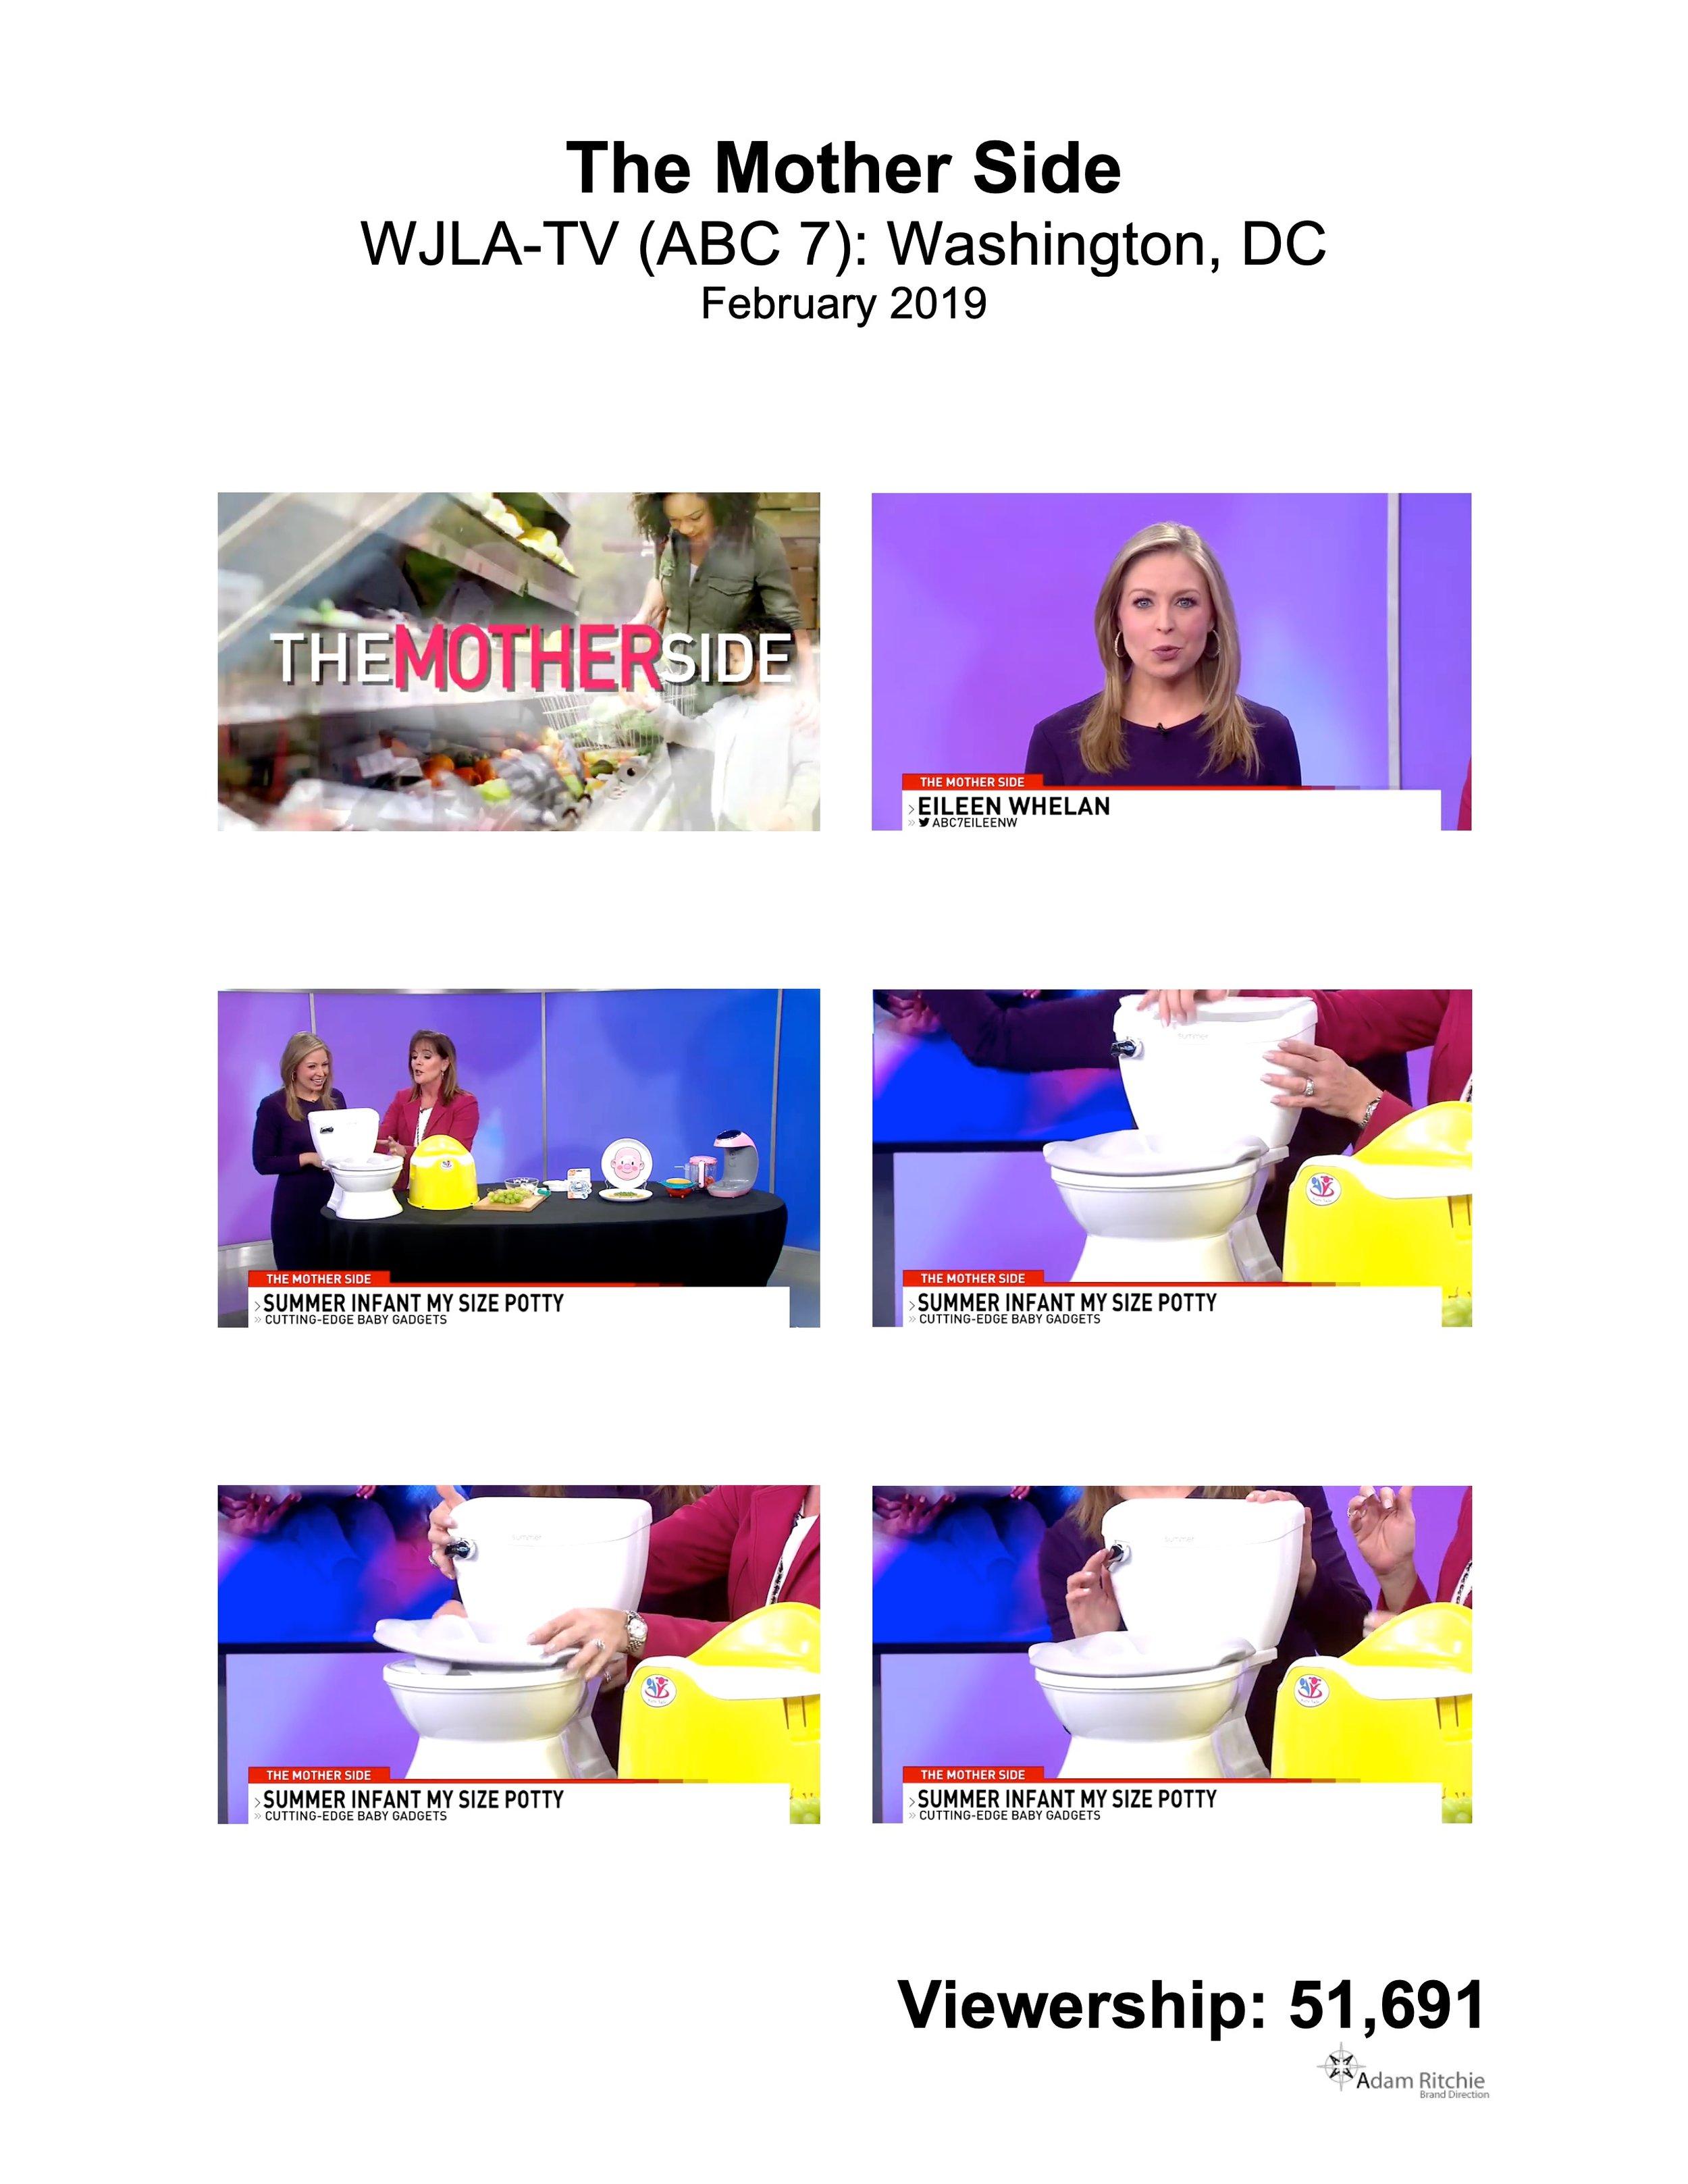 2019.02.23_WJLA-TV (ABC 7) Washington, DC The Mother Side_Summer My Size Potty Train & Transition.jpeg